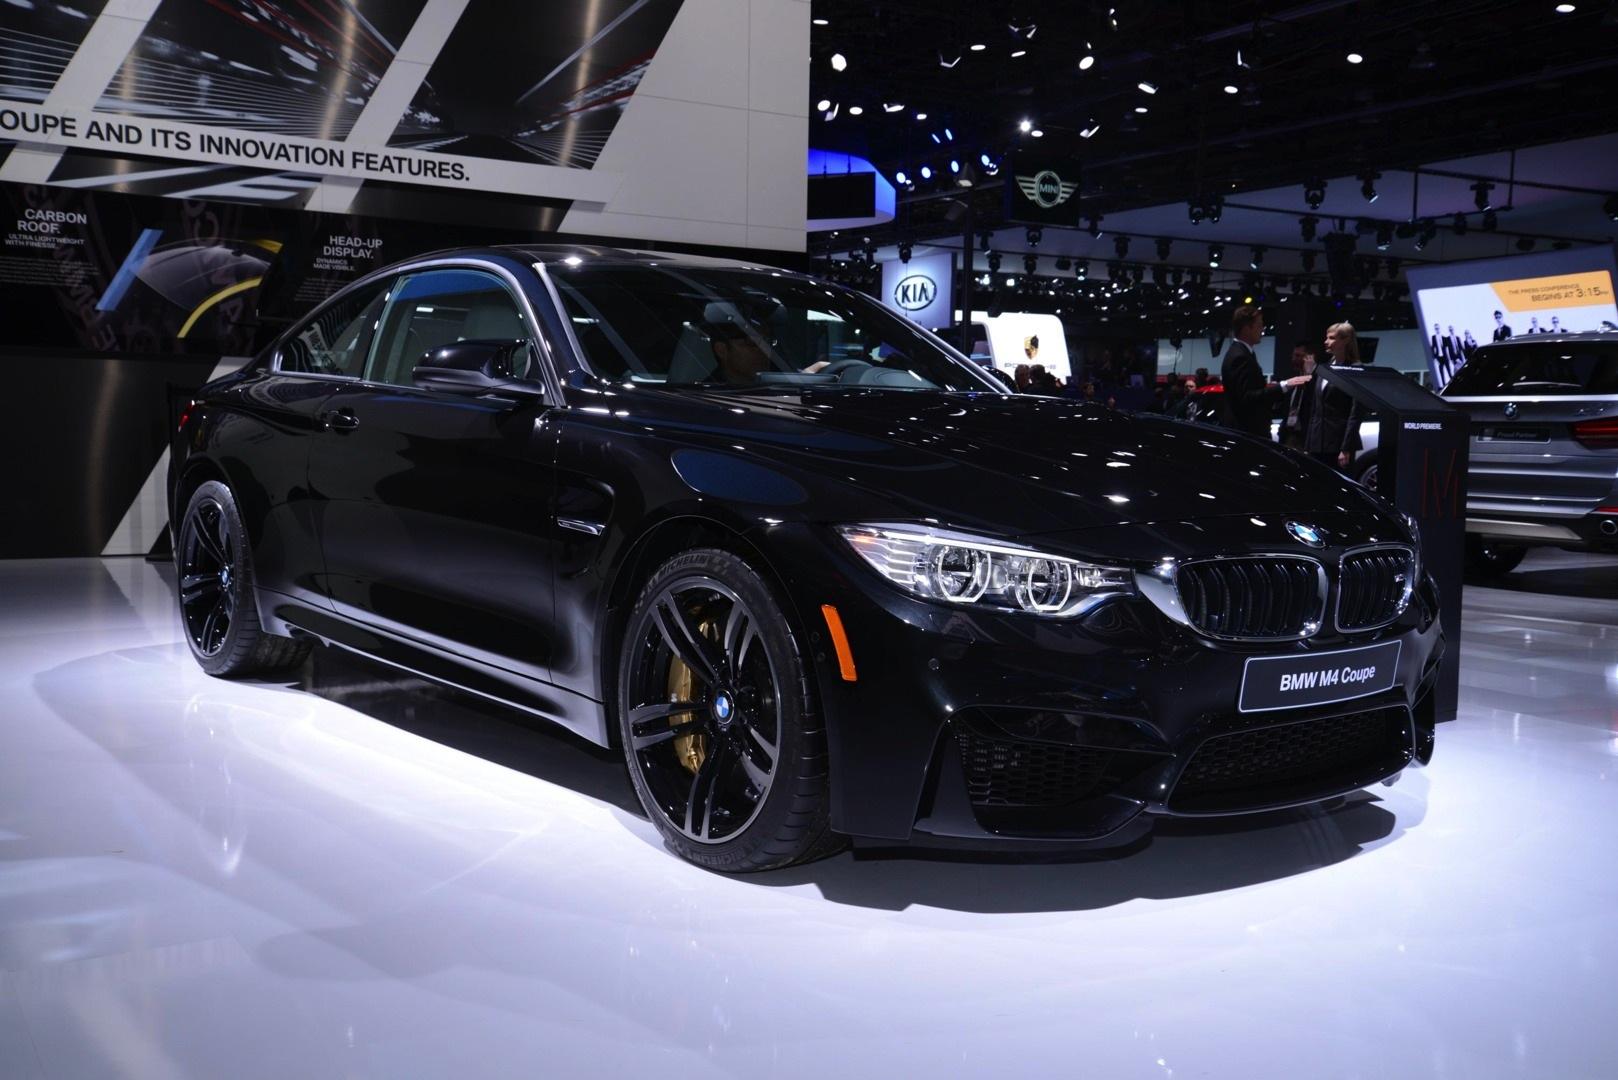 Sapphire Black BMW M Looks Brilliant At NAIAS Live Photos - Black bmw m4